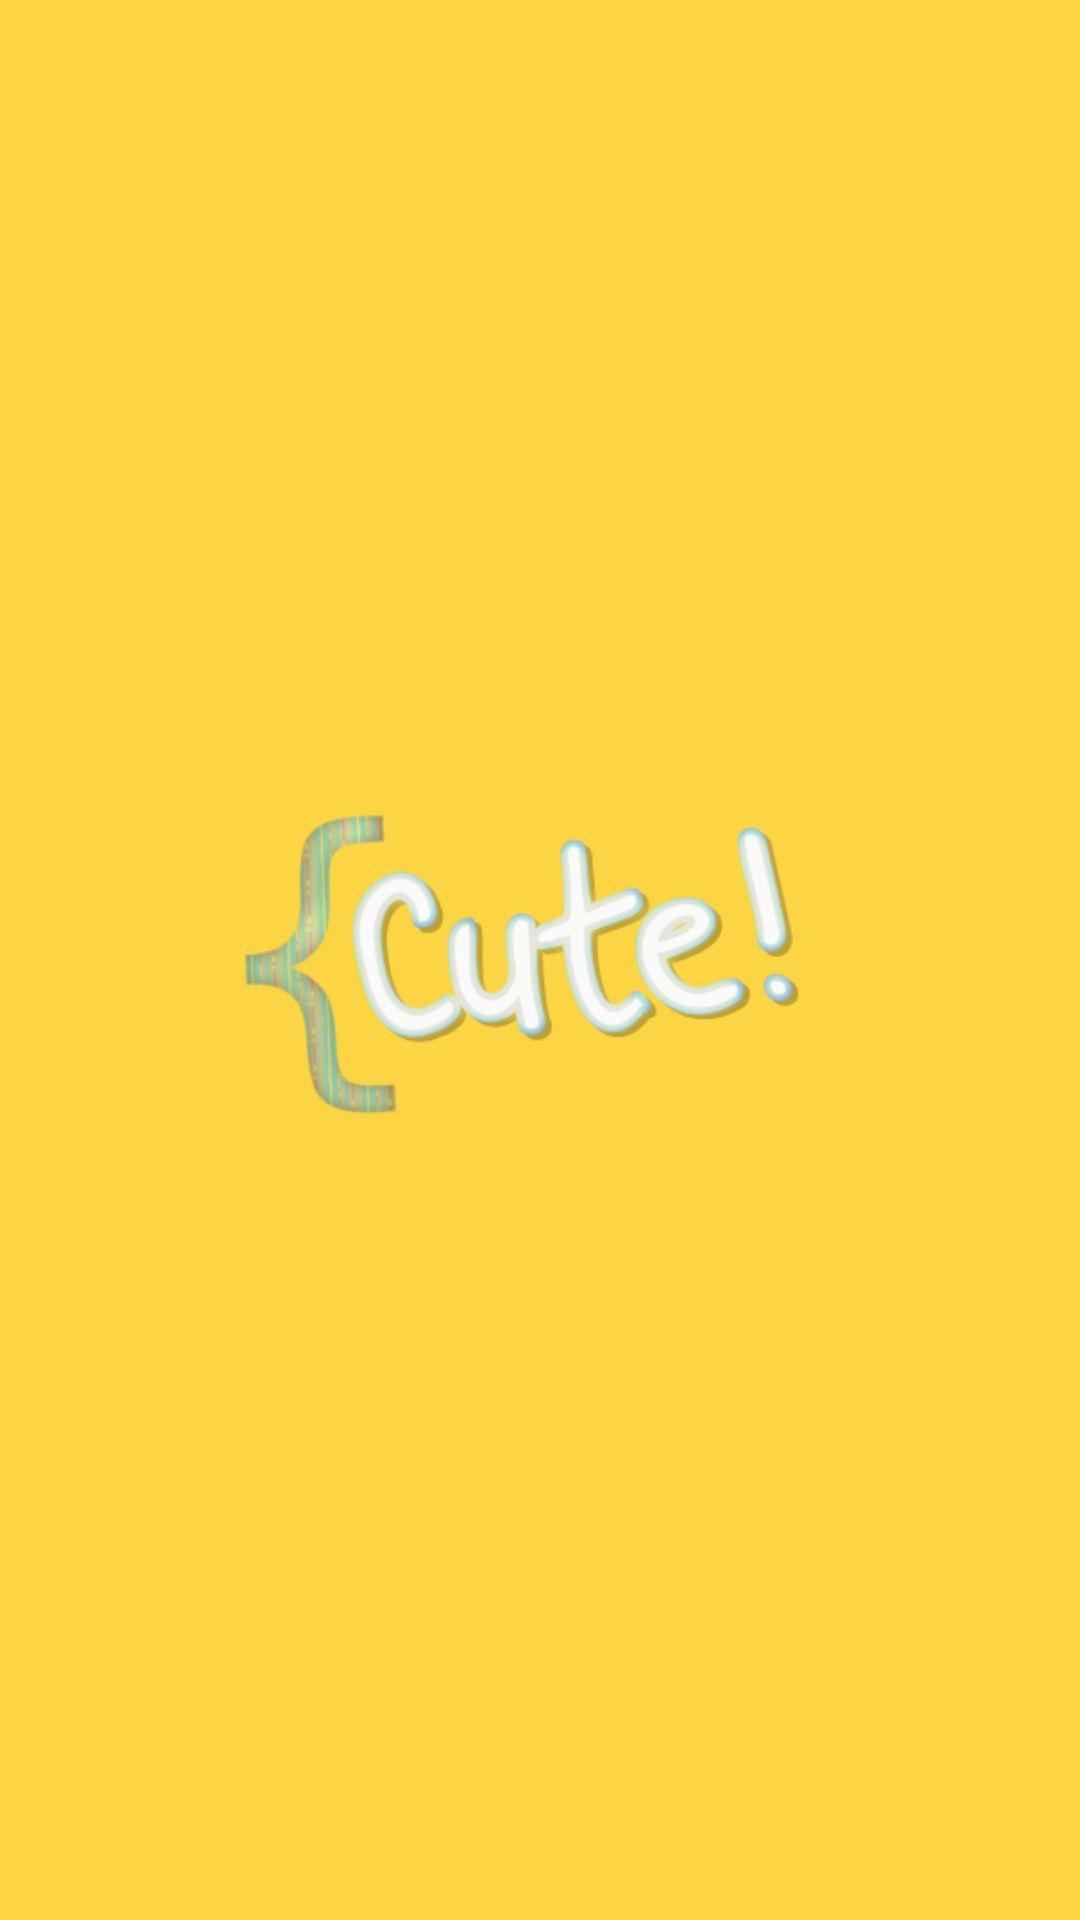 Iphone Wallpaper Iphone Wallpaper Wallpaper Cute